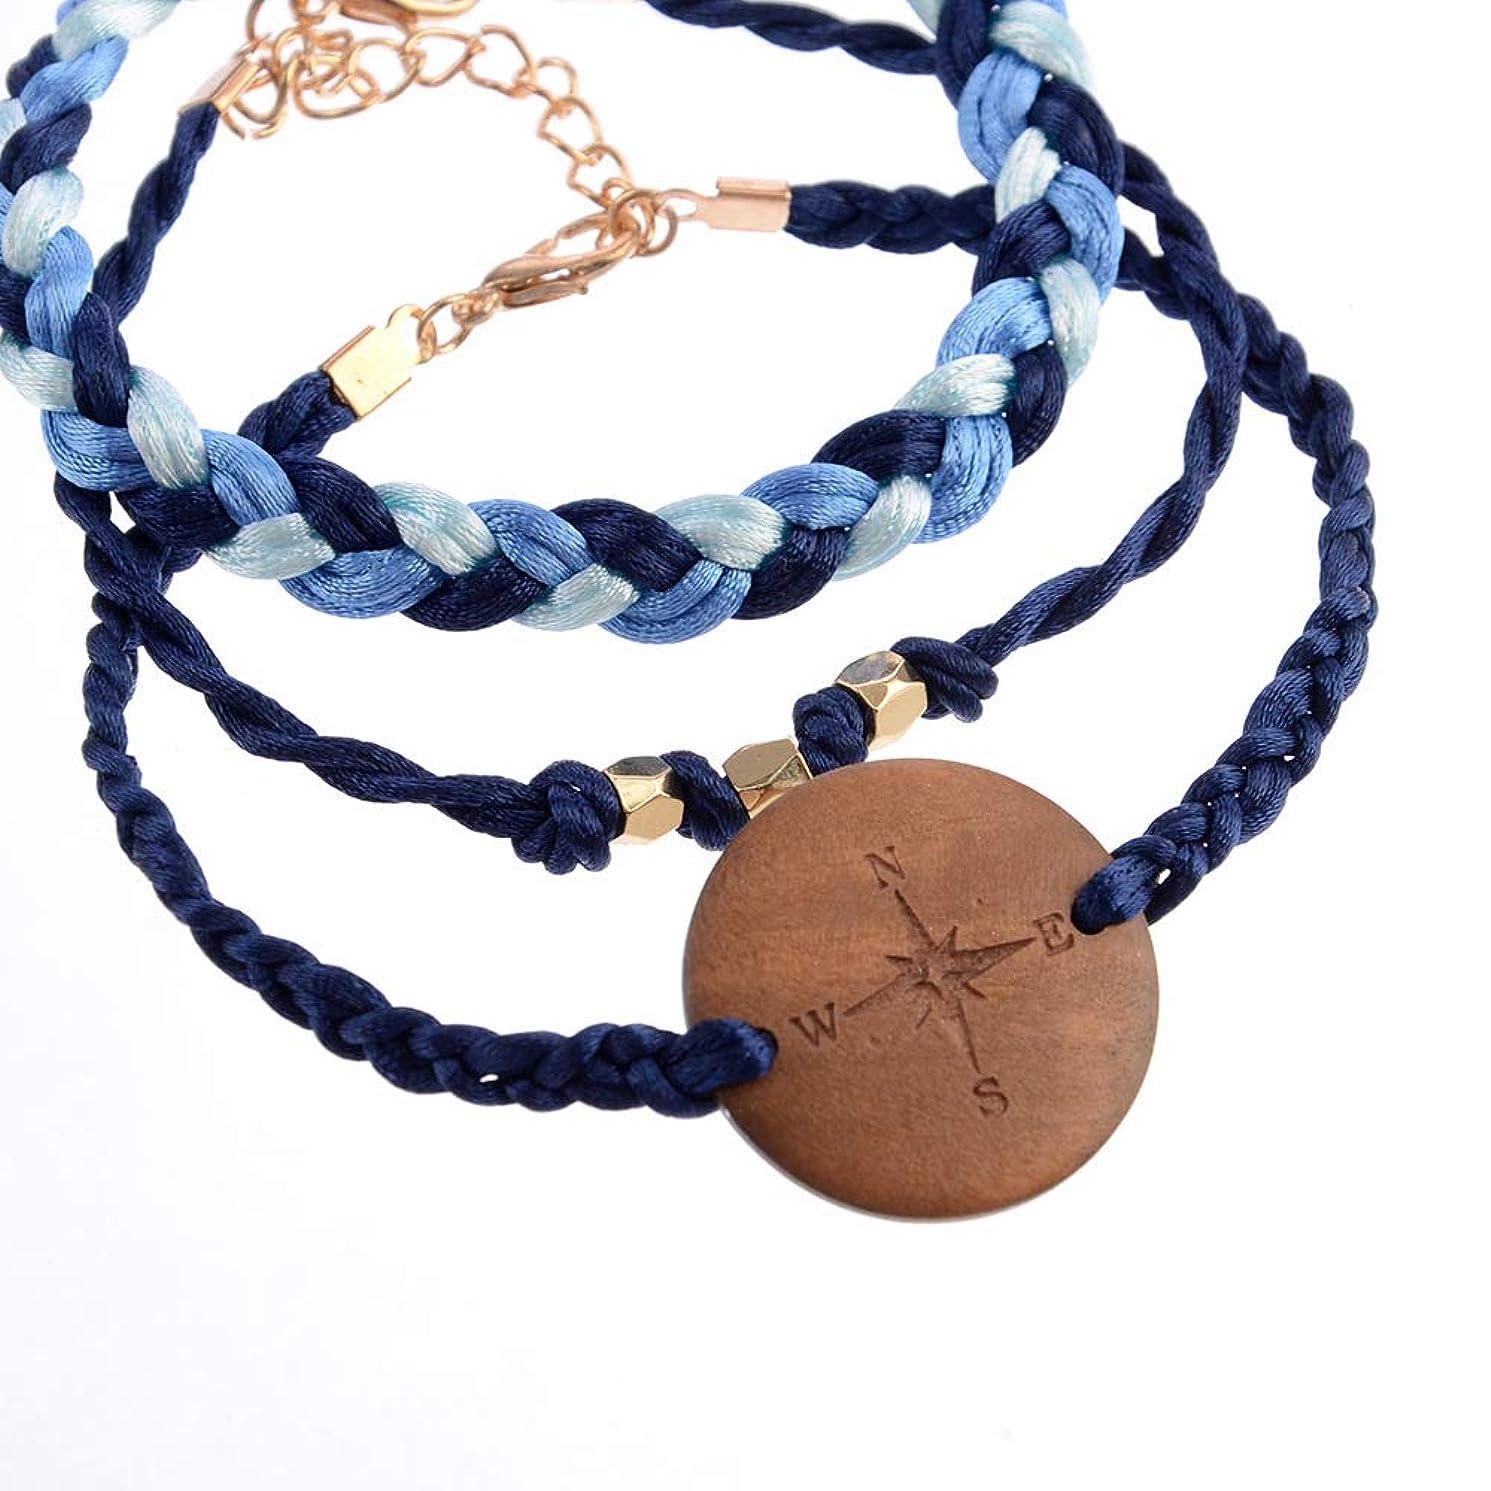 Handmade Braided Wax Rope Adjustable Strand Wrap Bracelet Set Waterproof Wave Shell Charm Stretch Knot String Thread Bracelets Anklets Pure Life Friendship Jewelry